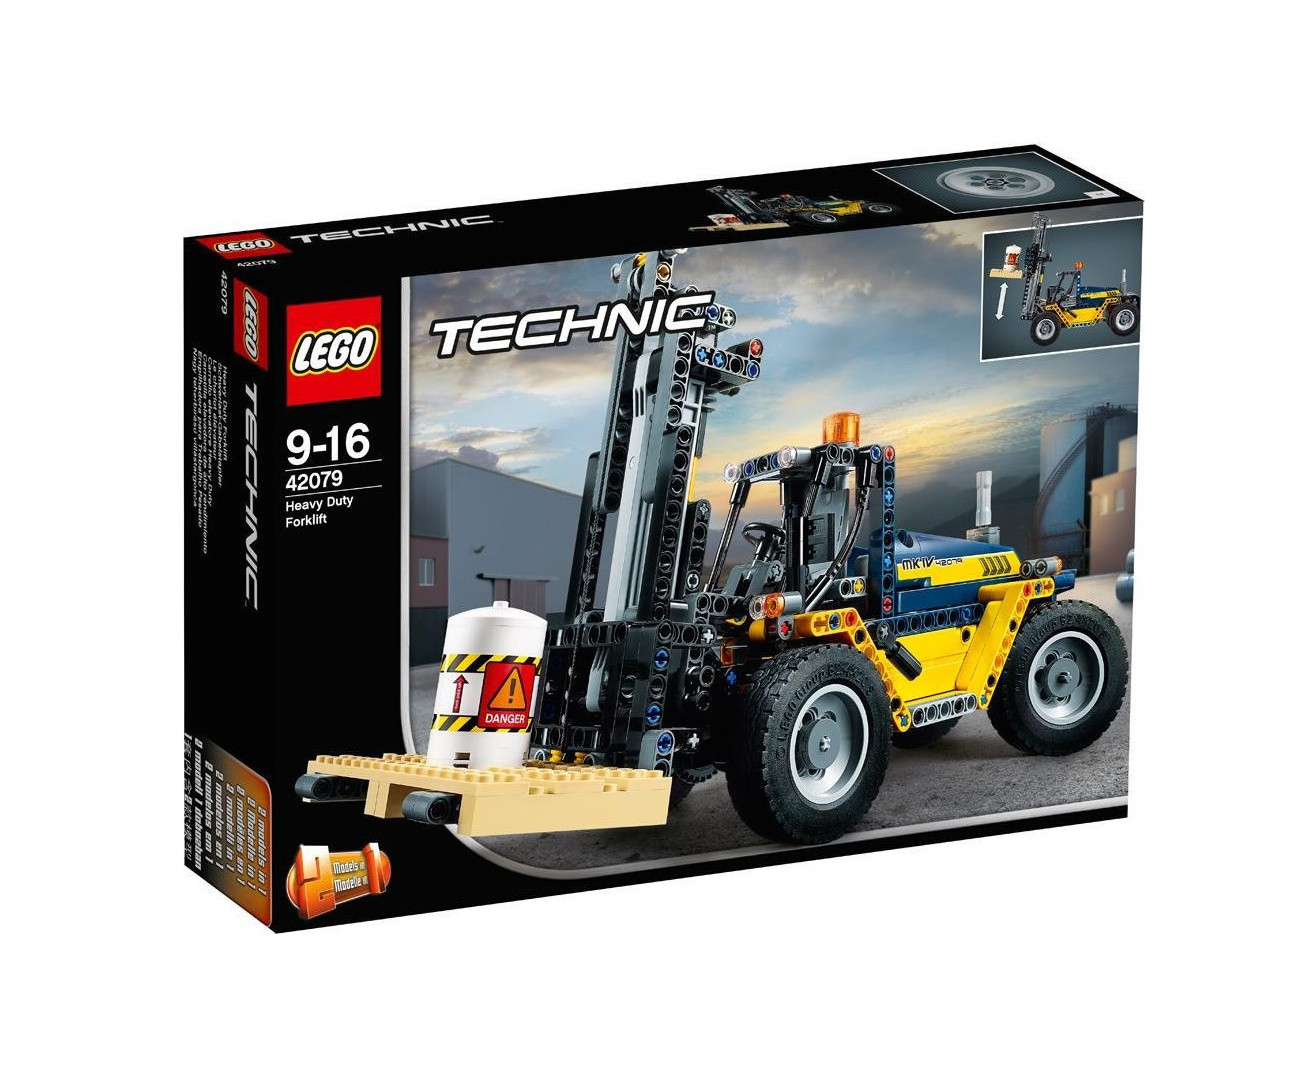 Lego Technic: Heavy Duty Forklift 42079